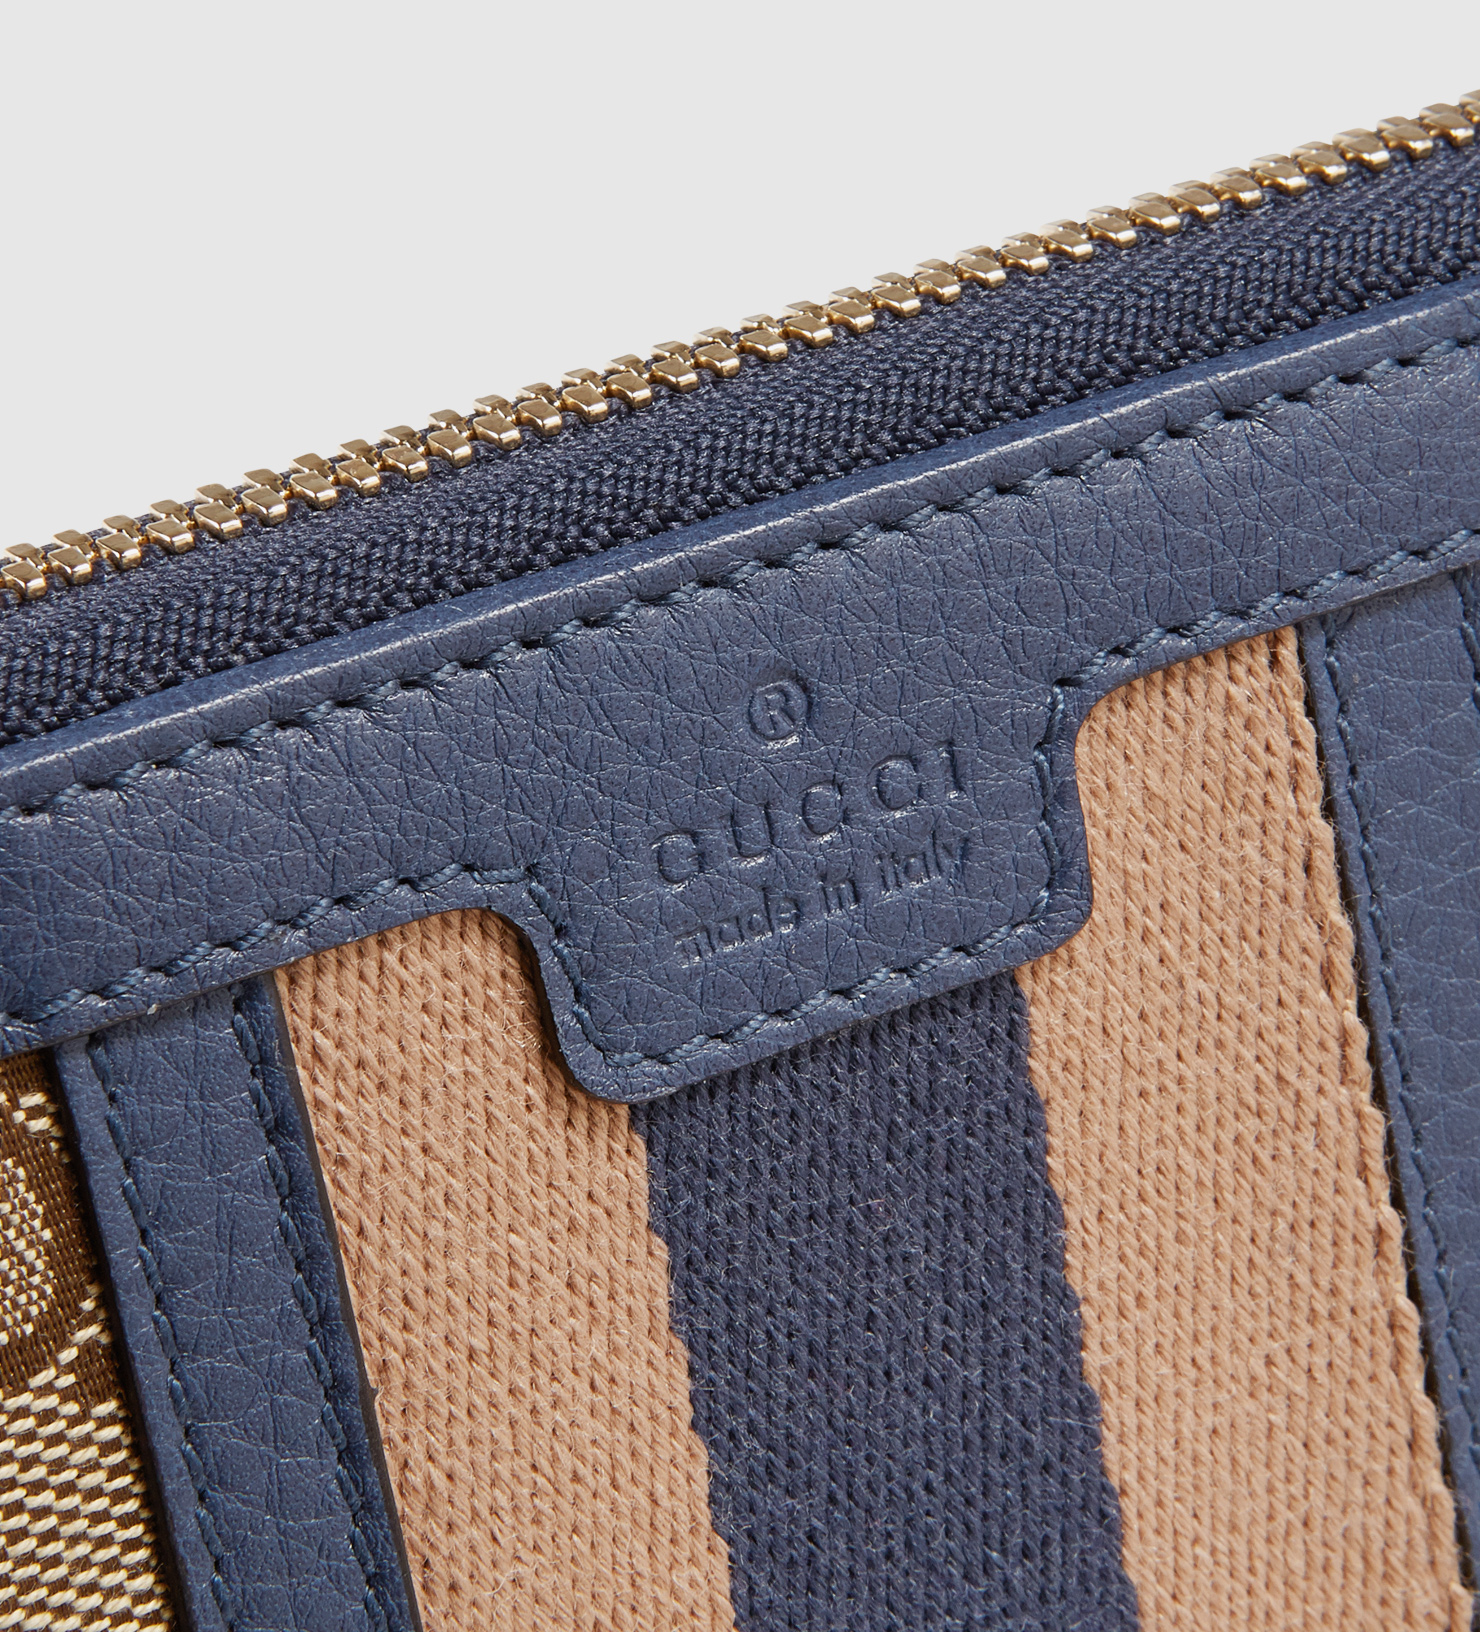 550f598126de89 Lyst - Gucci Rania Original Gg Canvas Zip Around Wallet in Blue